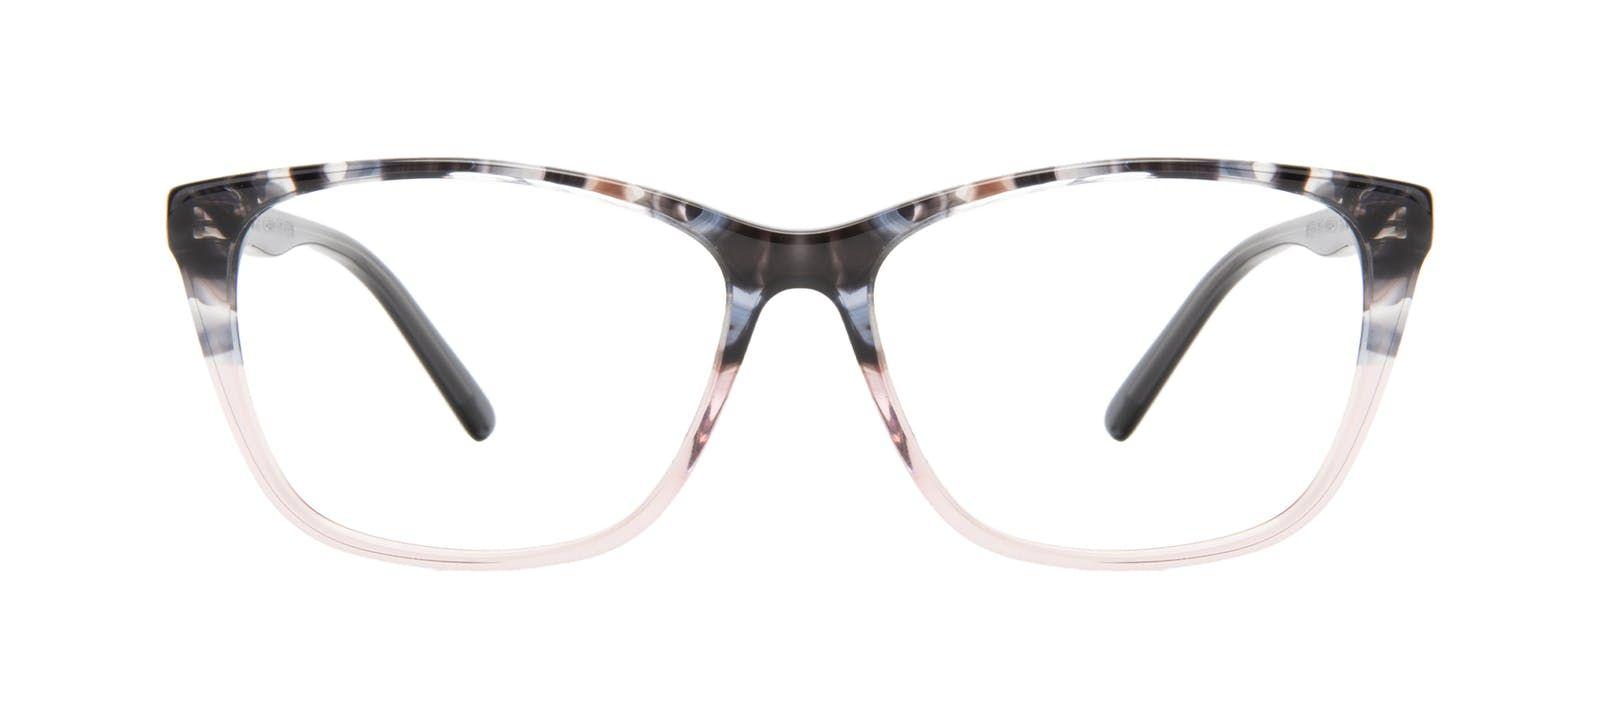 8e93796e0771 Affordable Fashion Glasses Cat Eye Rectangle Eyeglasses Women Myrtle  Carbone Pink Front